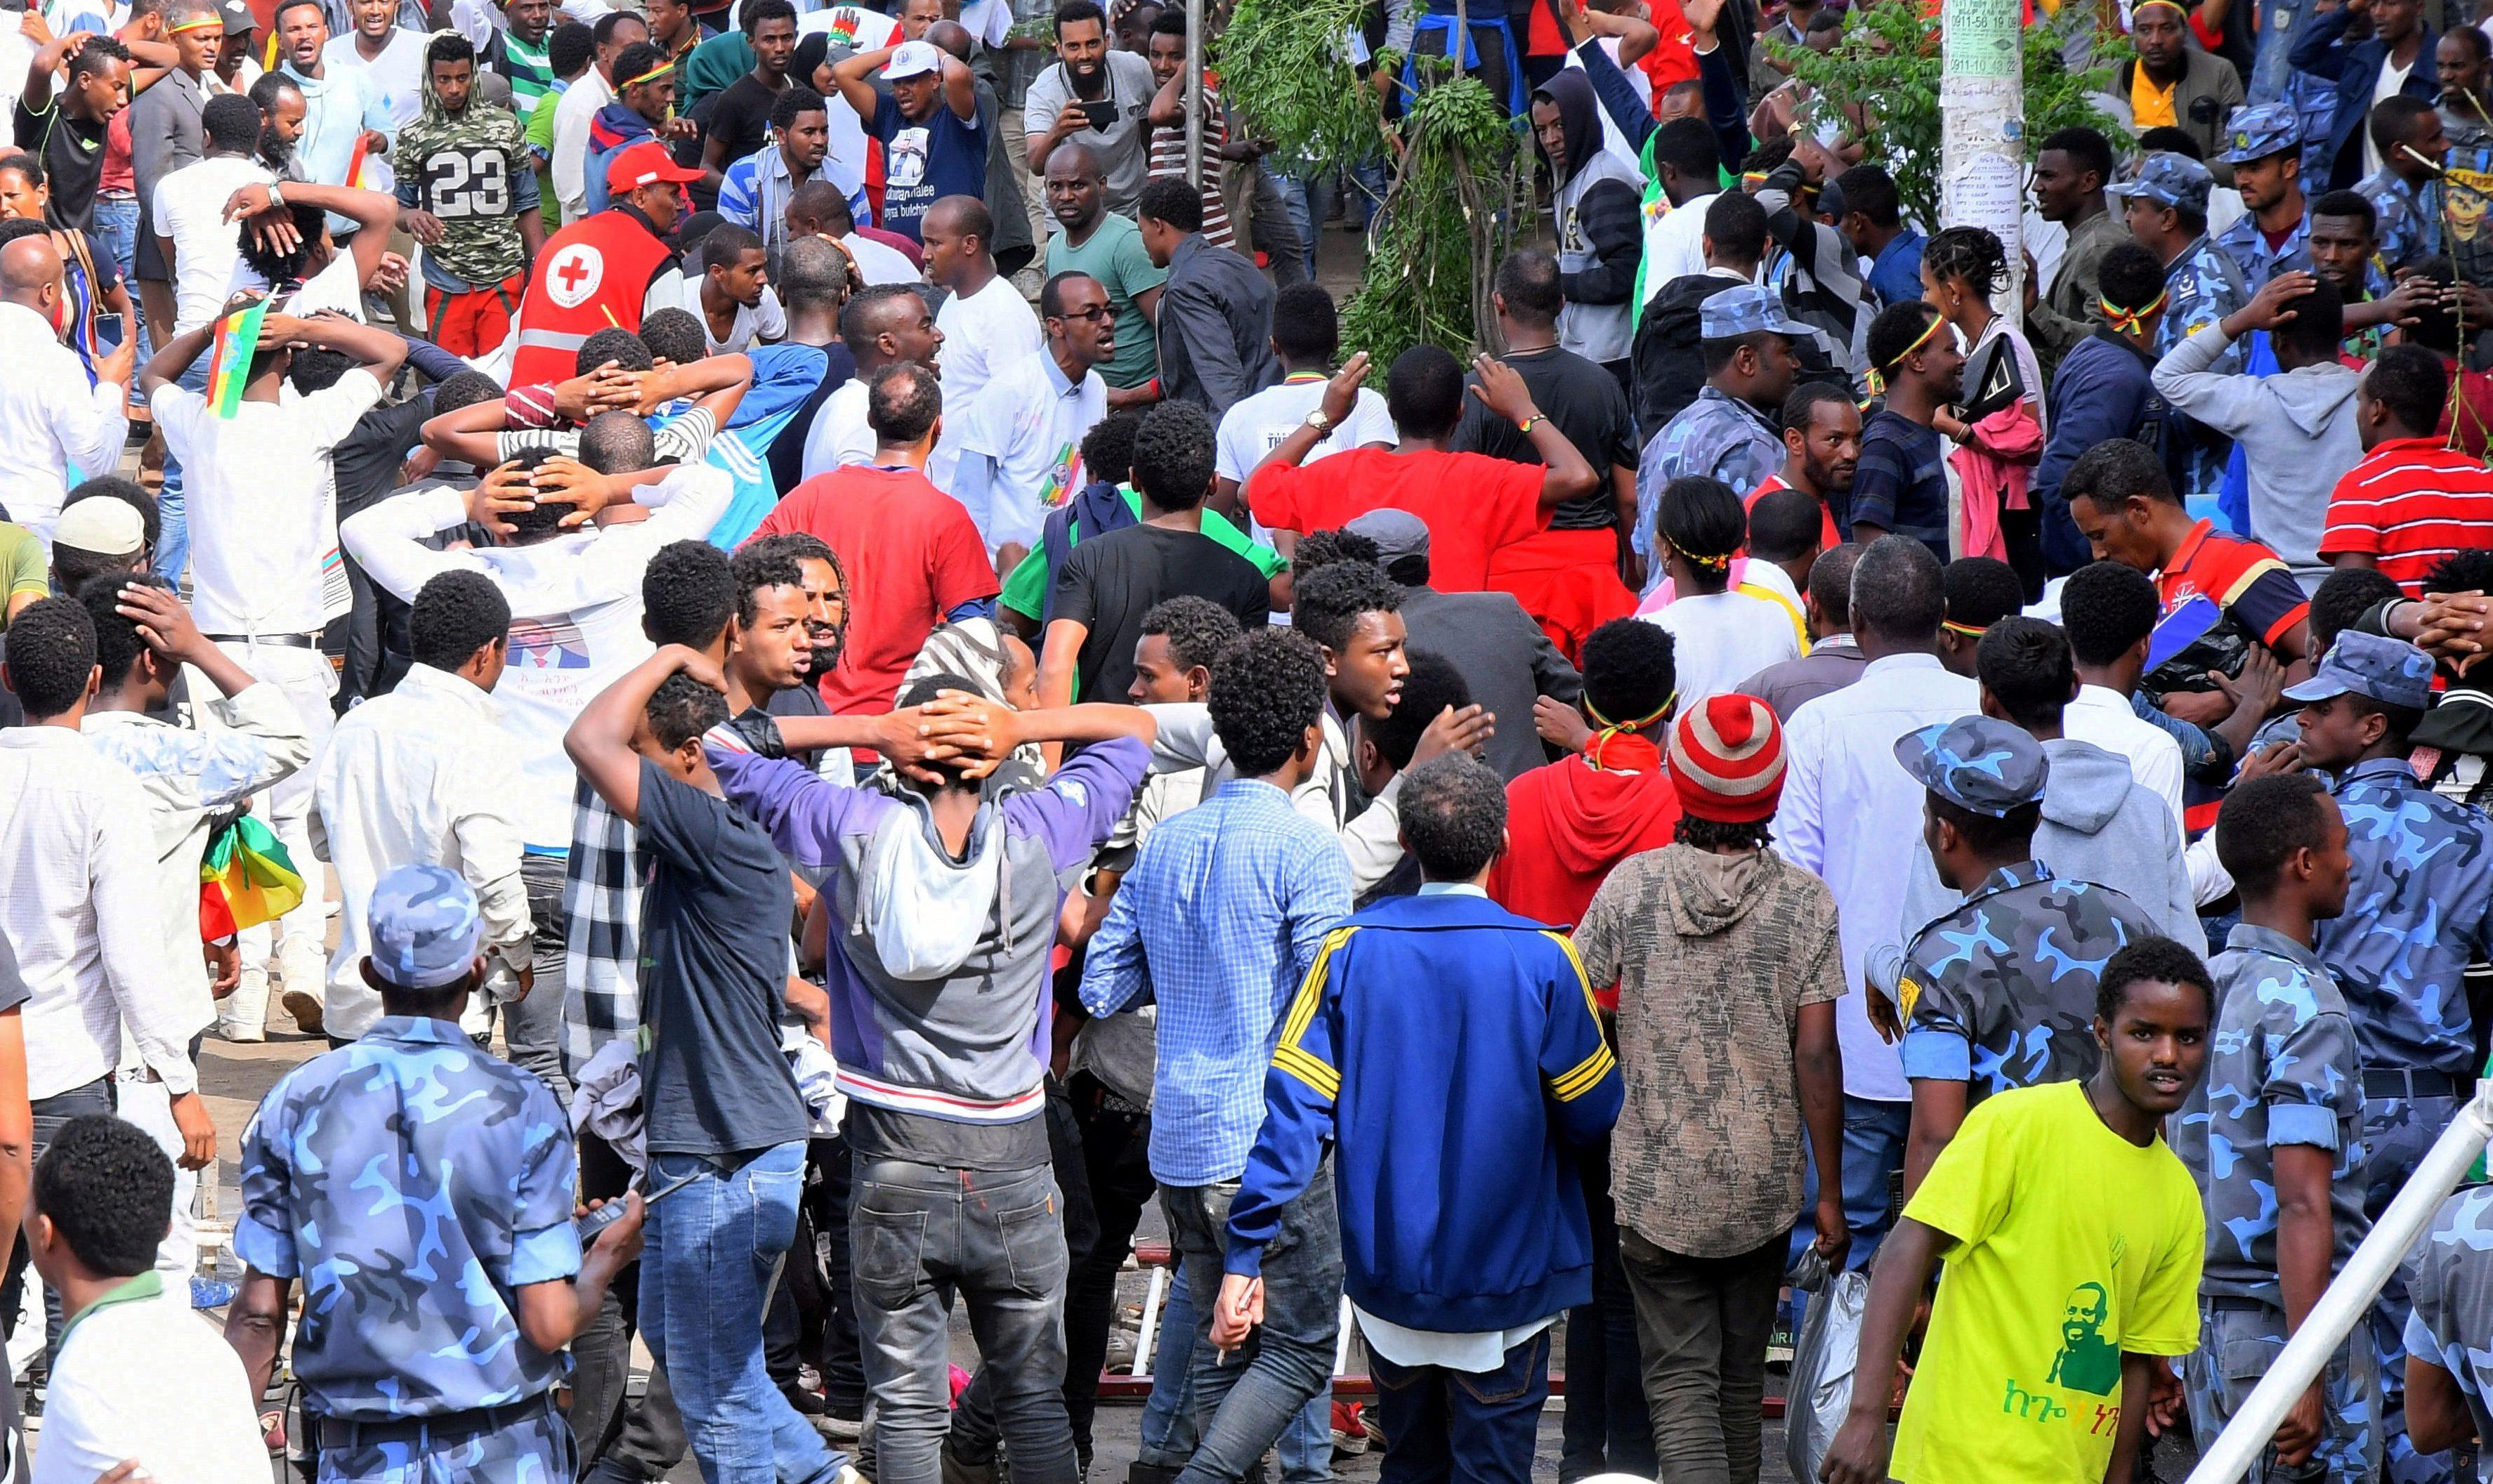 Ethiopia's ethnic violence history with Oromos, Amharas